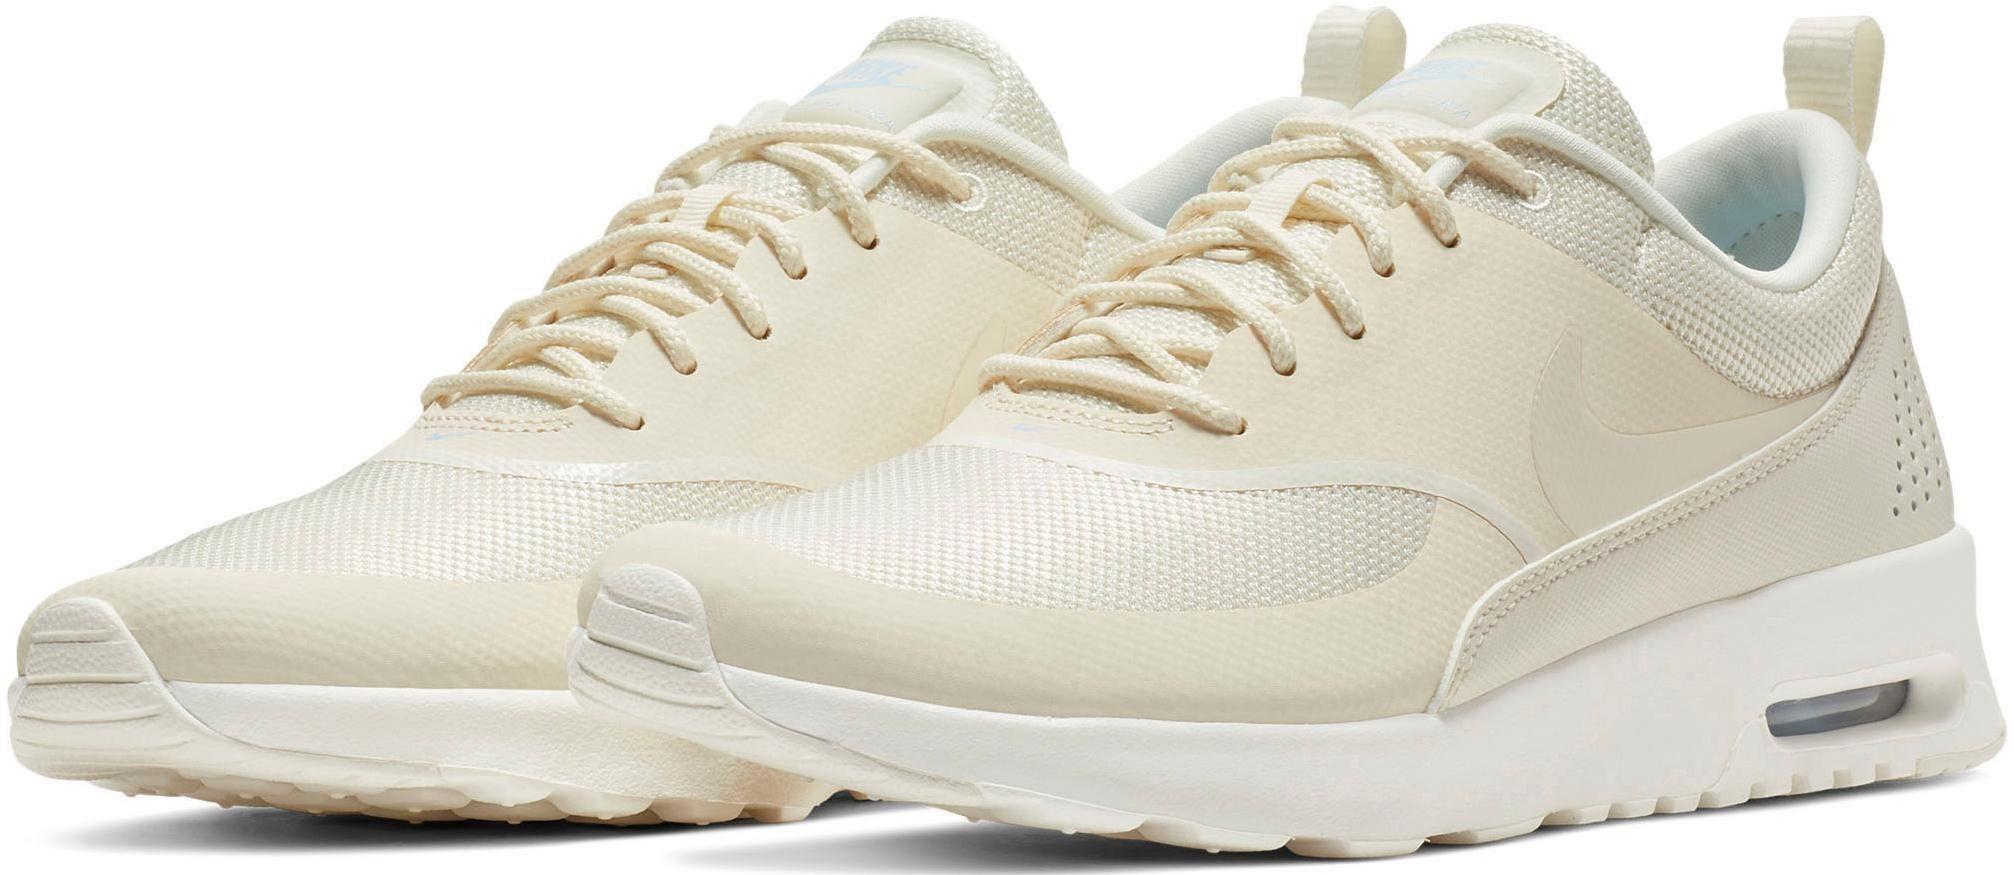 Sneaker Thea« »air Max Nike Sportswear TkiOXuPZ